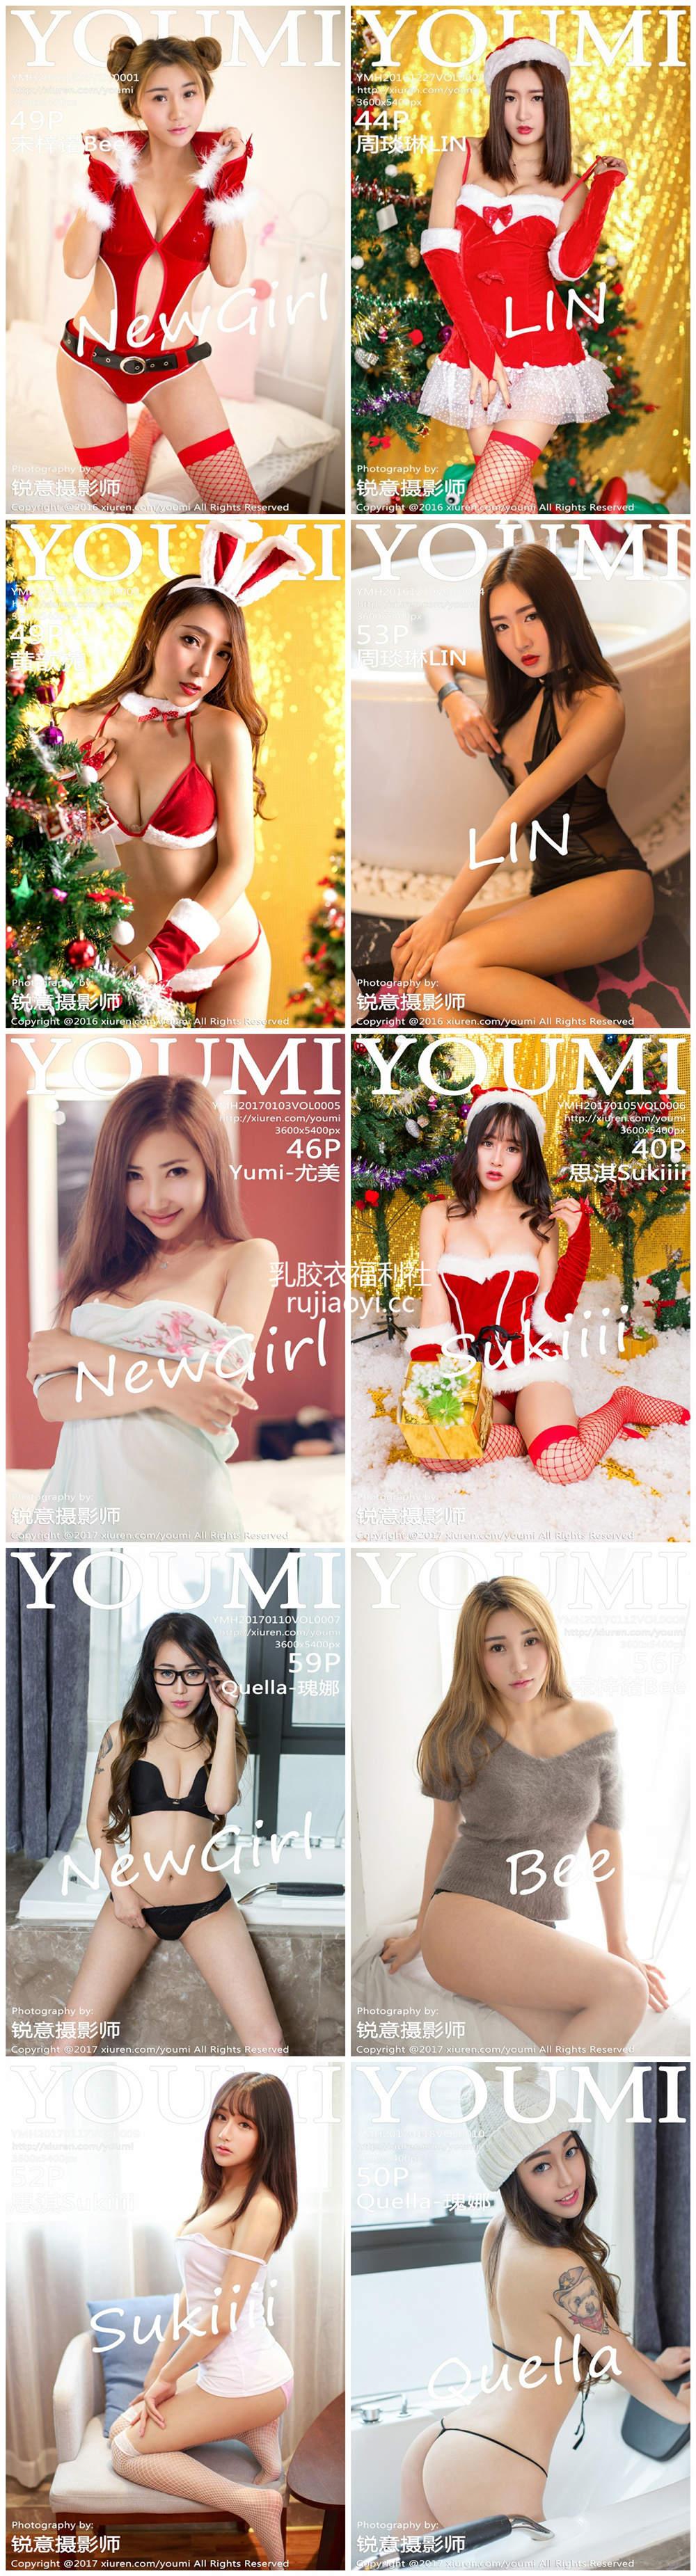 [YOUMI尤蜜荟] Vol.001-010 秀人旗下系列 10期性感美女写真百度云合集下载